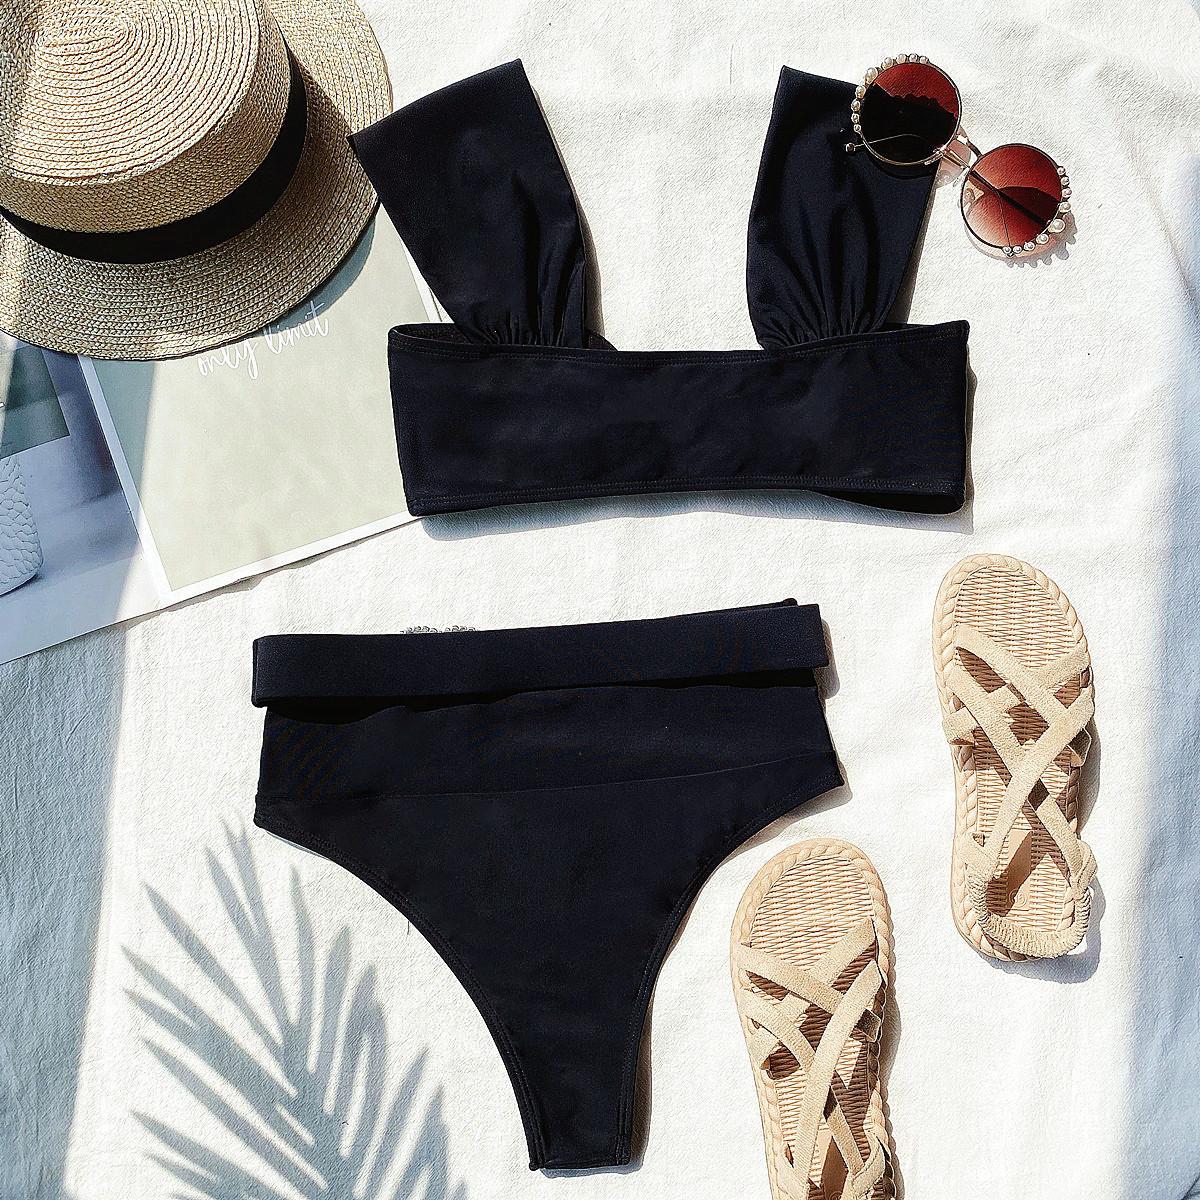 New Bikini Bikini Solid Color Love Swimsuit Outer Single Lady Swimwear wholesale nihaojewelry NHDA228406